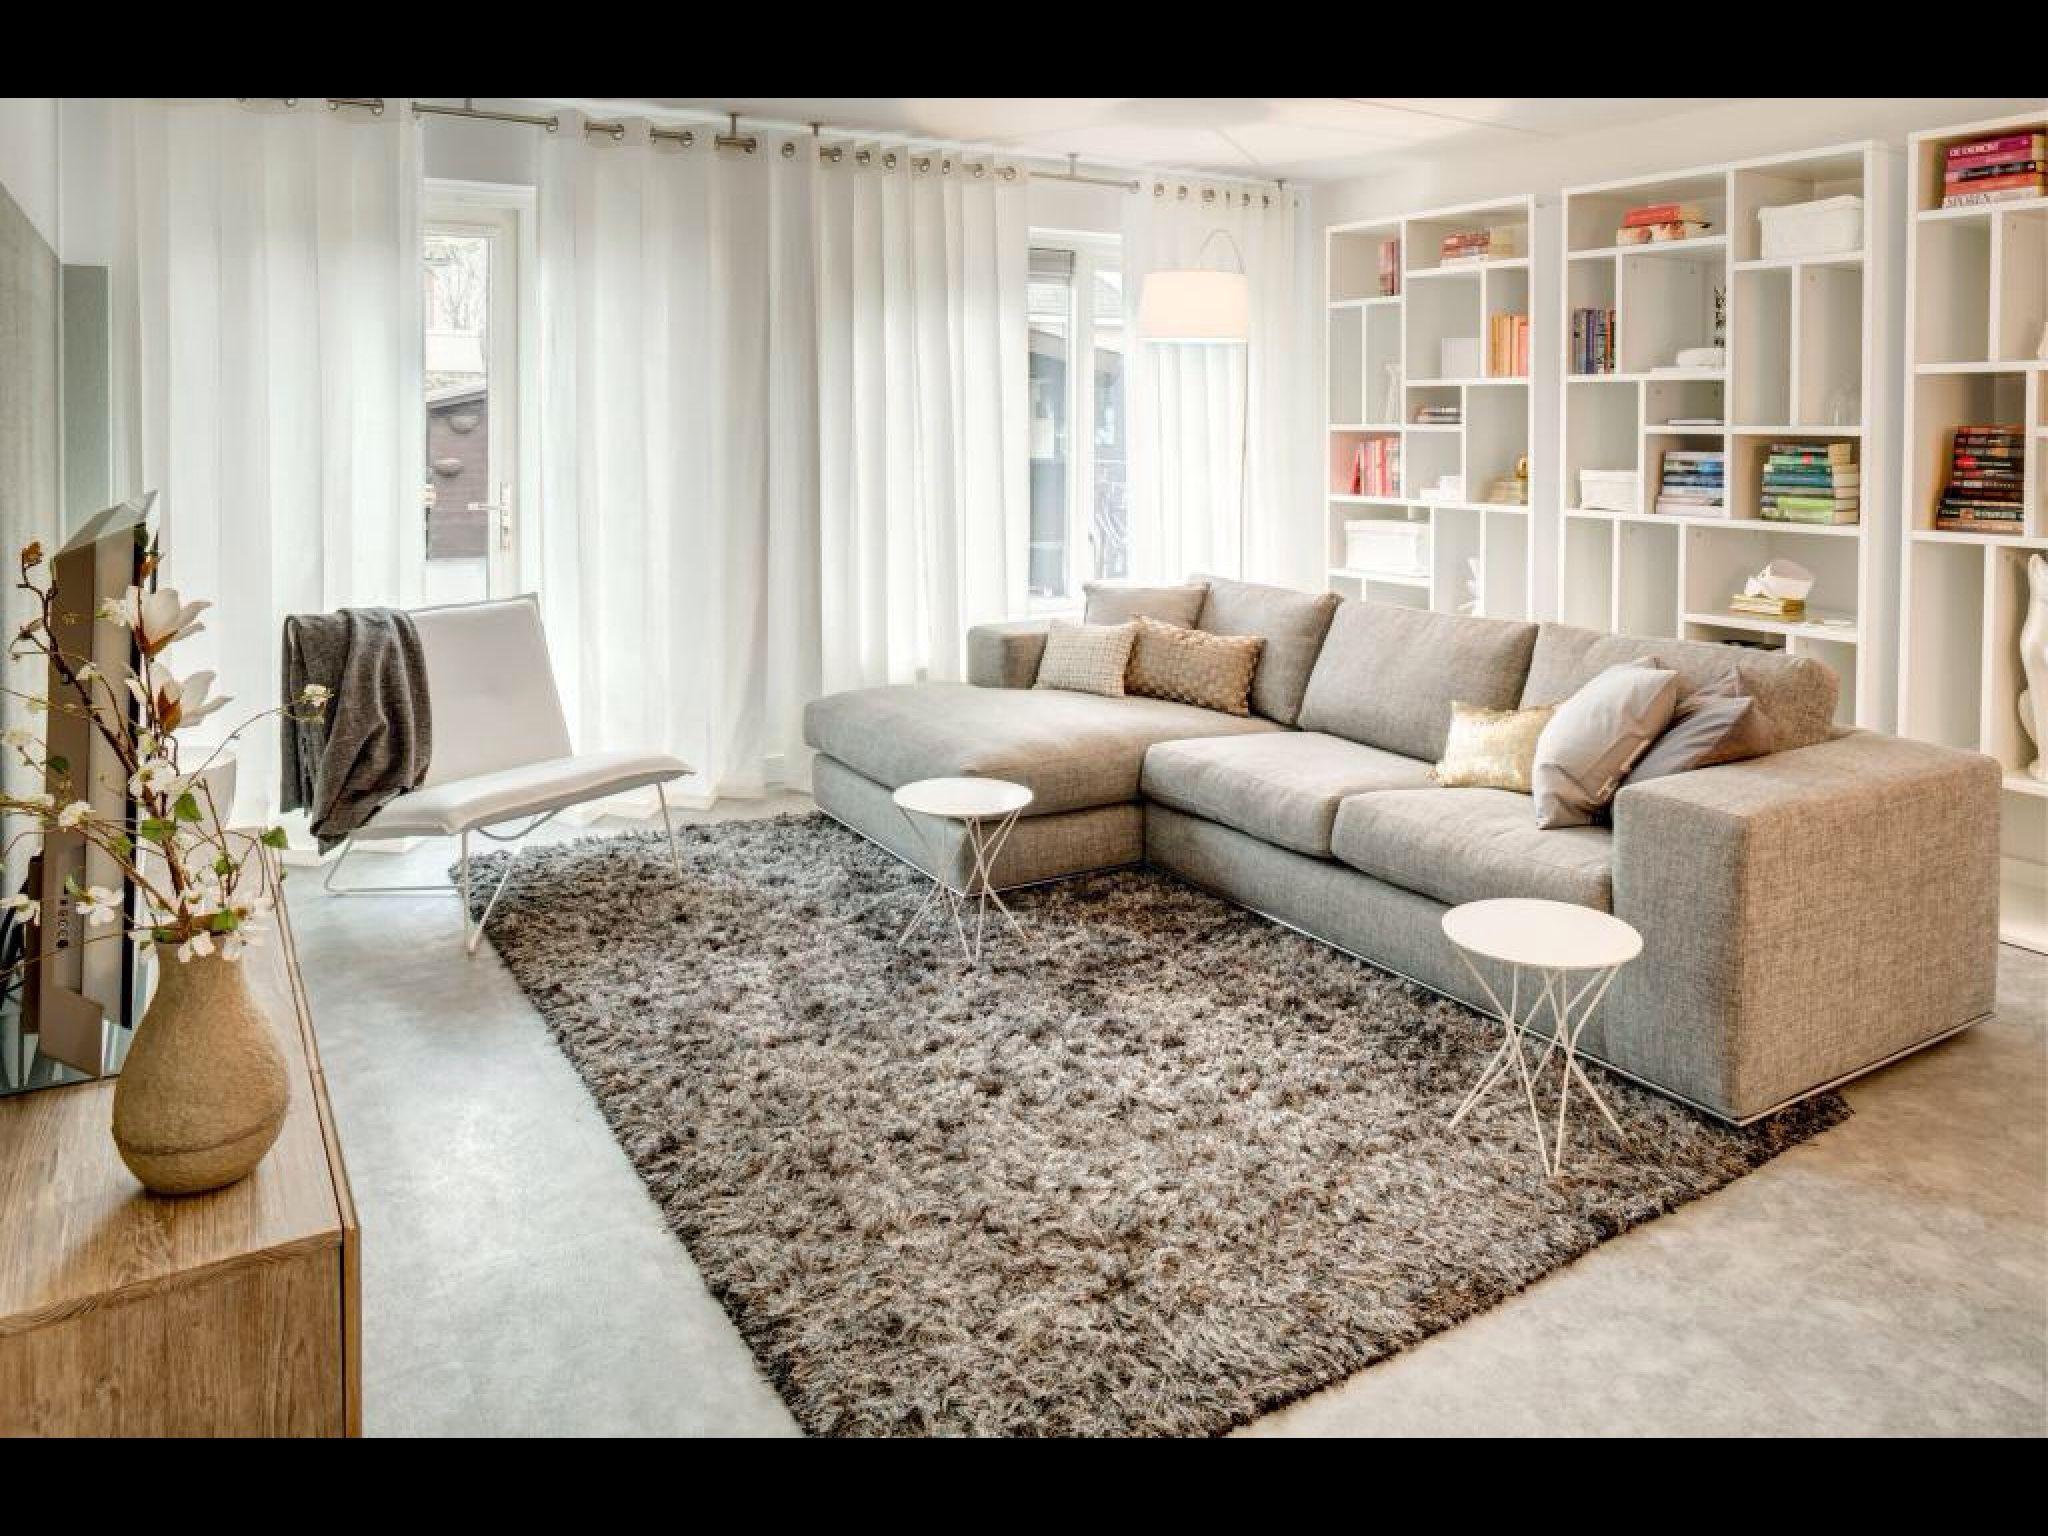 Leuke stijl witte gordijnen mooie bank mooi for Vloerkleed woonkamer